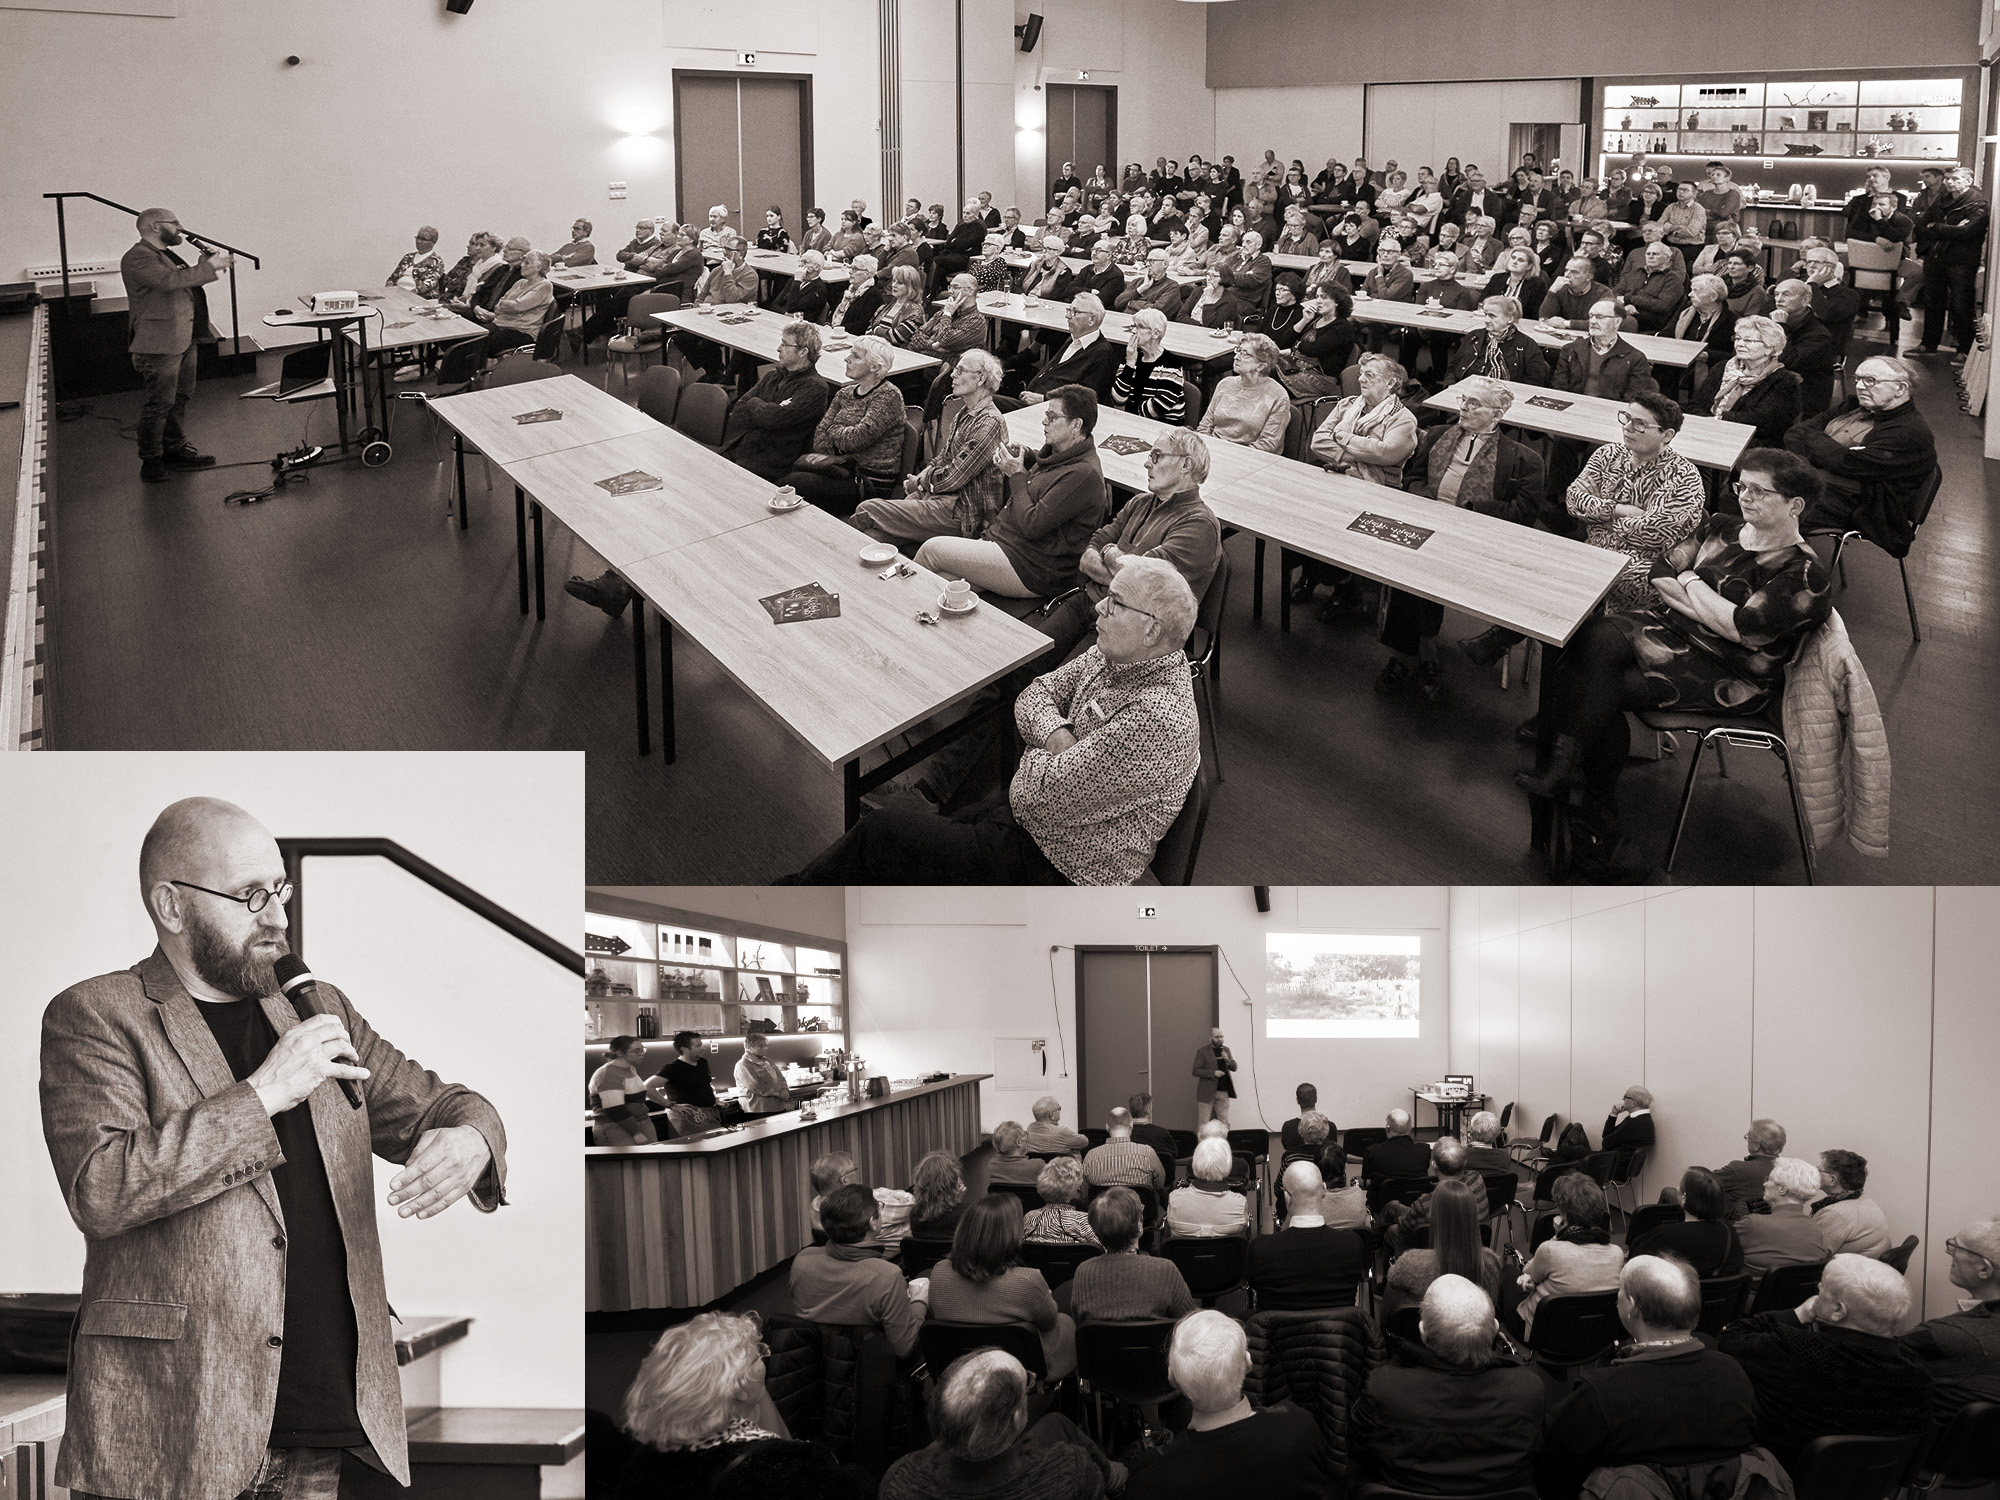 Hazeler Paorte lezing Jacquo Silvertant Cutureel erfgoed romeinen in Haasdal Schimmert